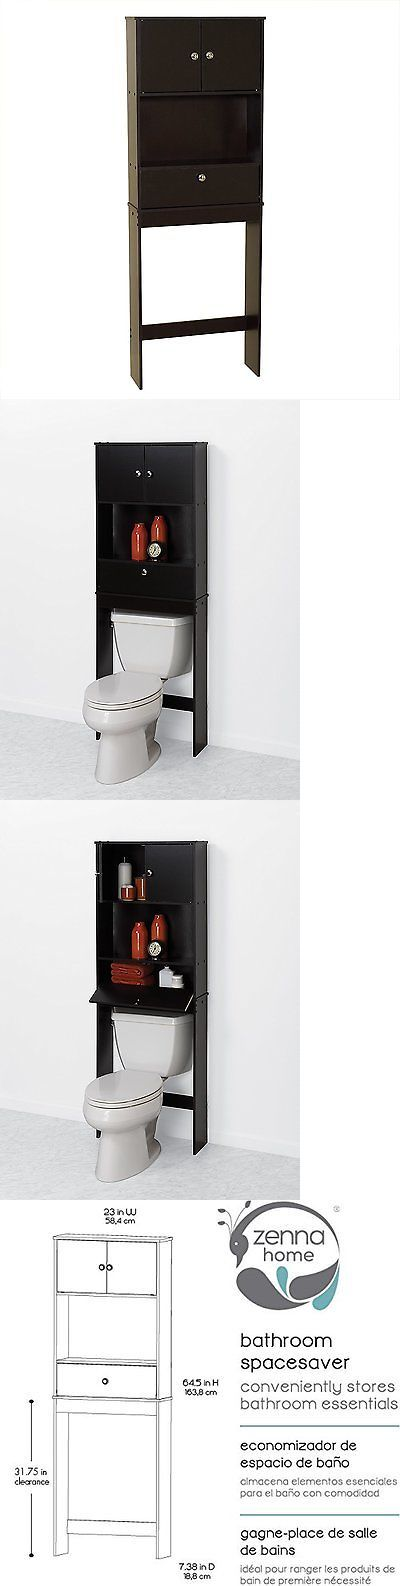 Bath Caddies and Storage 54075: Bathroom Spacesaver Drop Door Over The Toilet Storage Display Cabinet Organizer -> BUY IT NOW ONLY: $53.76 on eBay!